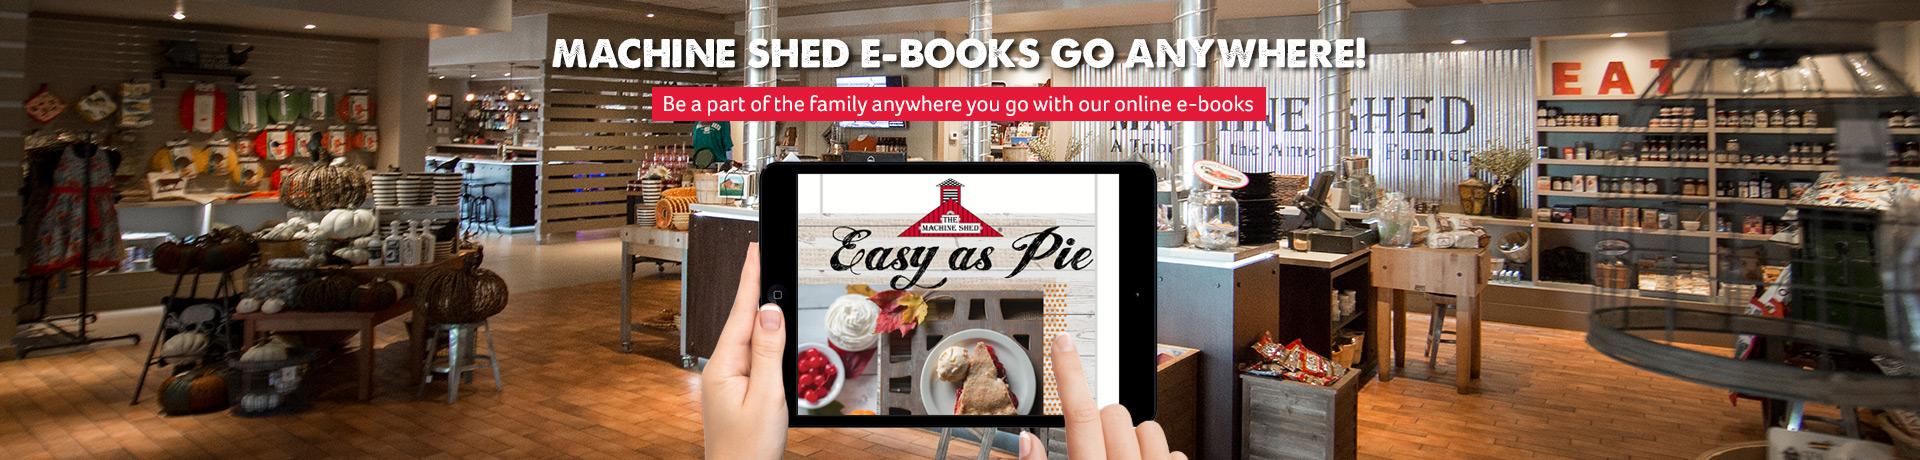 Machine Shed E-Books